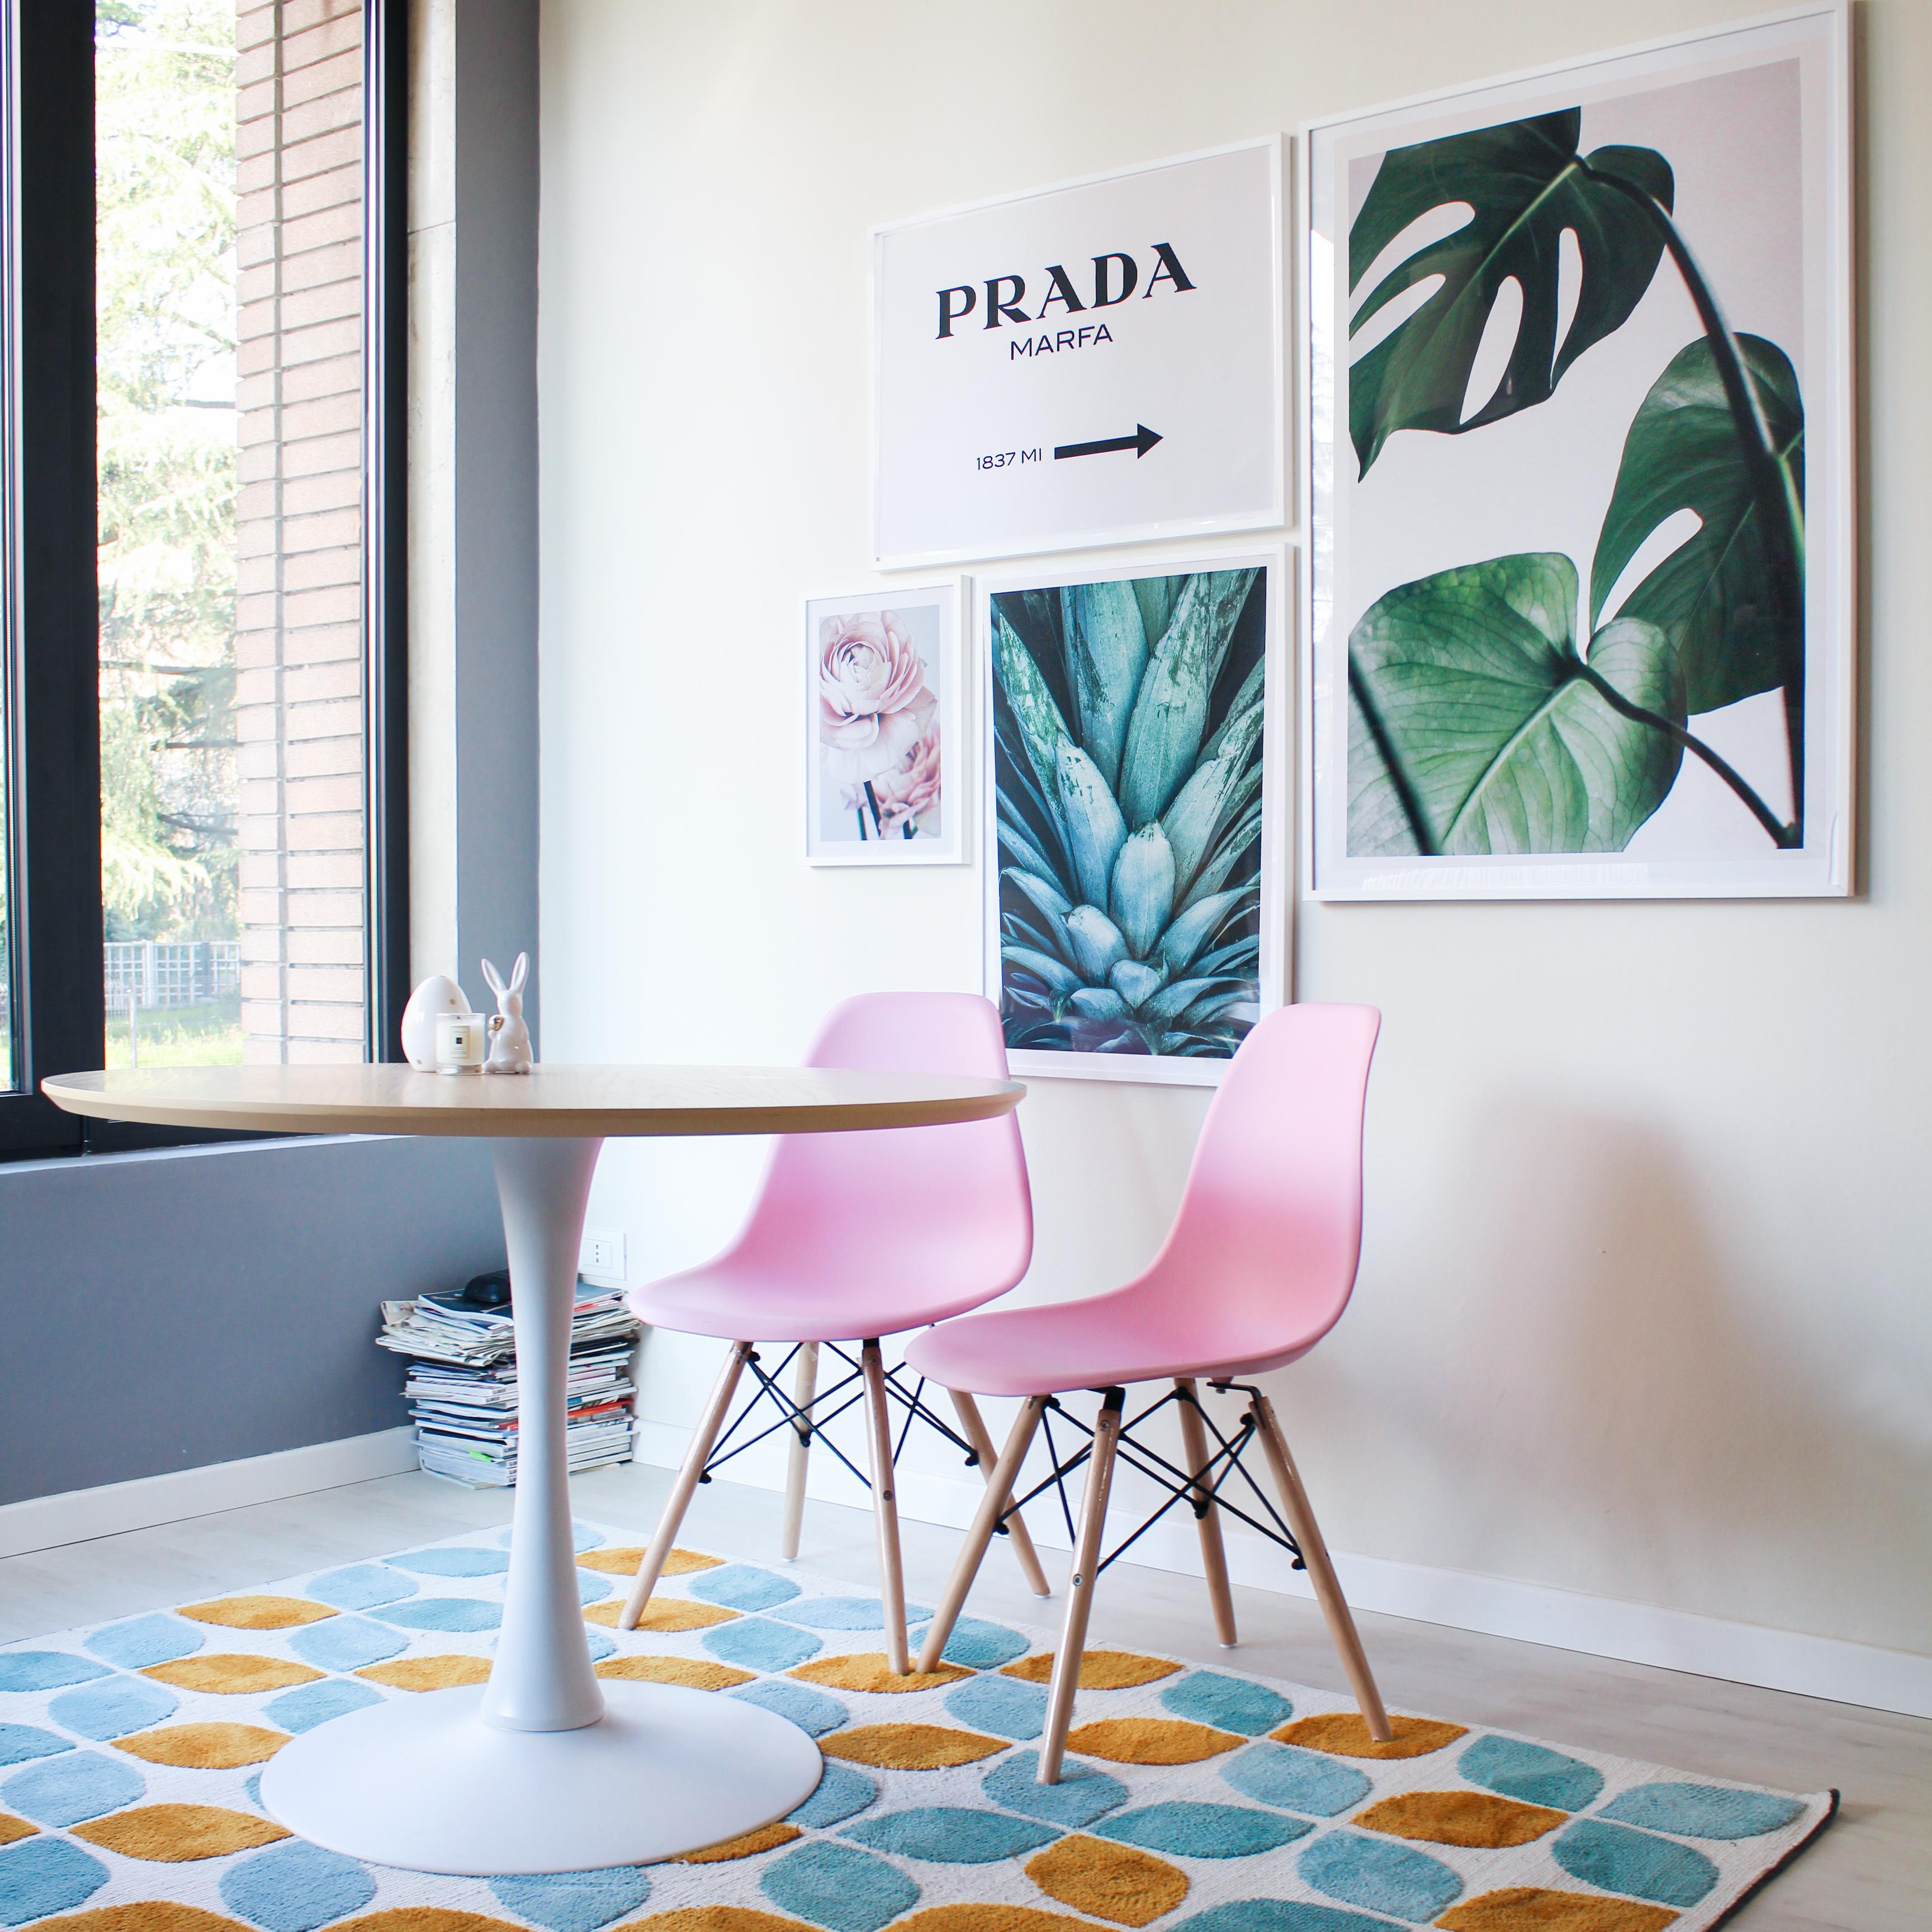 alessia-canella-styleshouts-blog-fashion